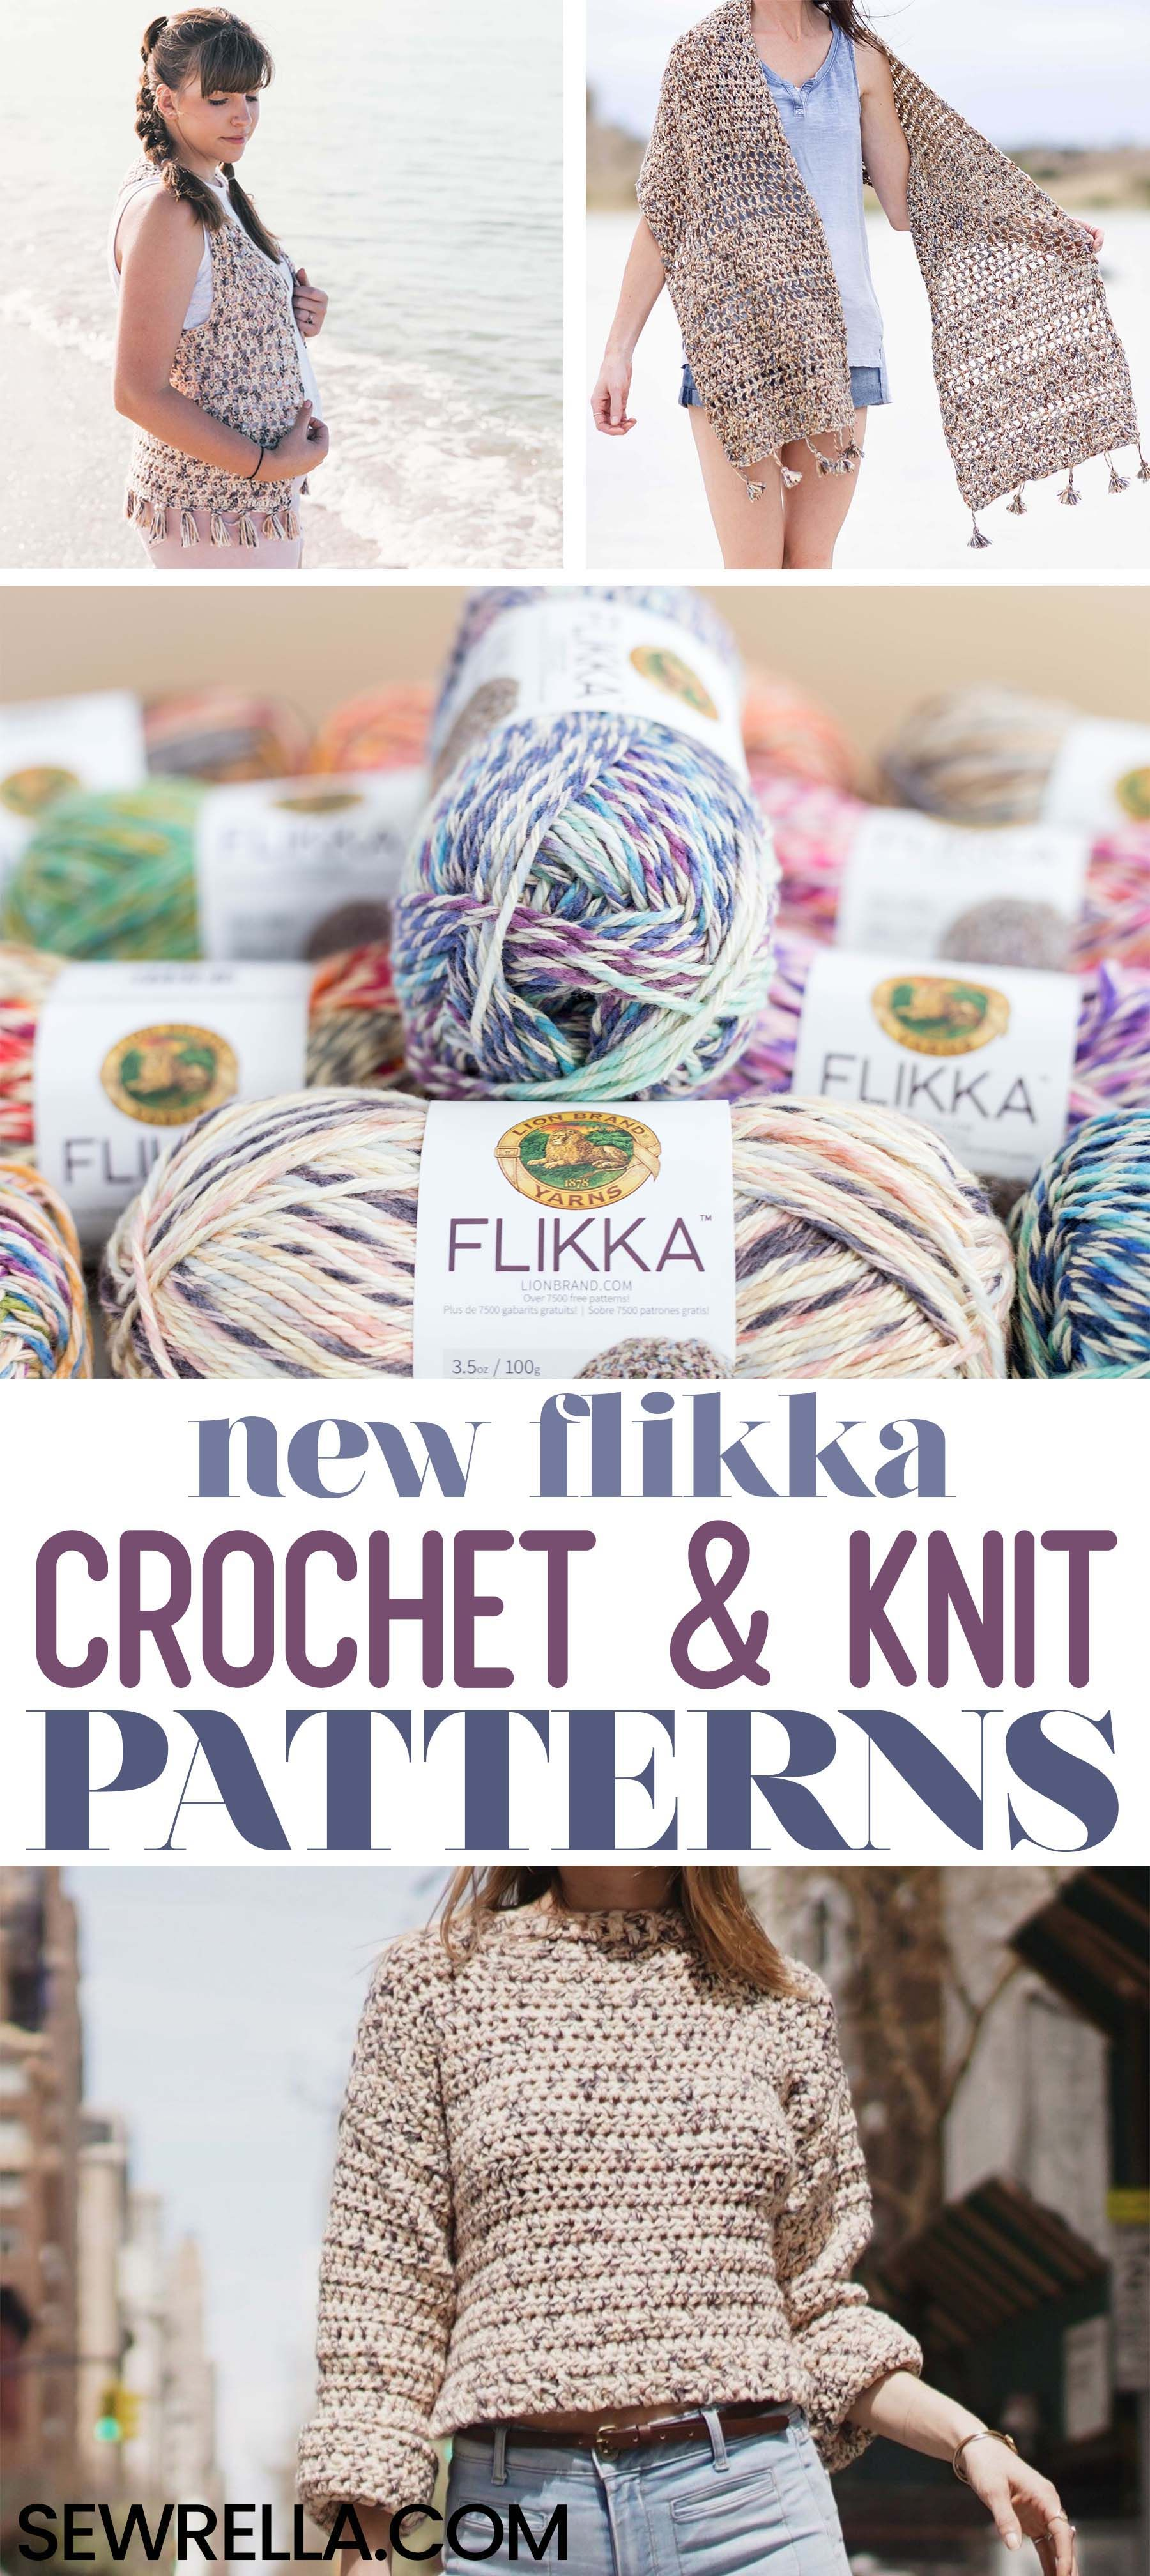 10+ Lion Brand Flikka Crochet & Knit Patterns | CrochetHolic ...